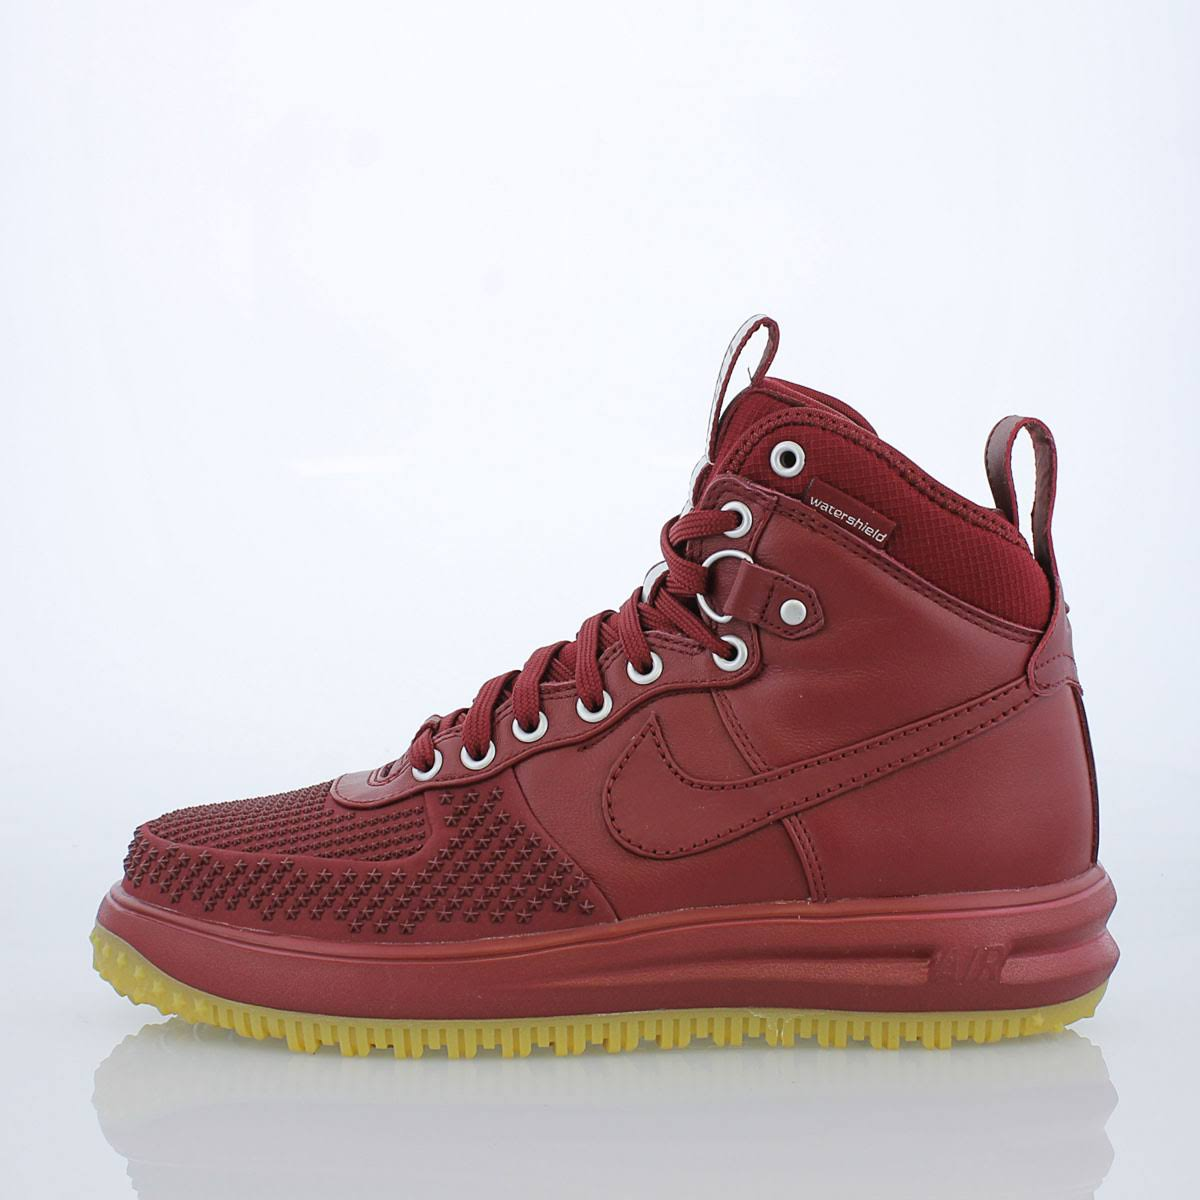 Nike Red Tamaño Duckboot Shoes 1 13 Force Lunar 805899 Gum Team 600 Men 0twqr0nP